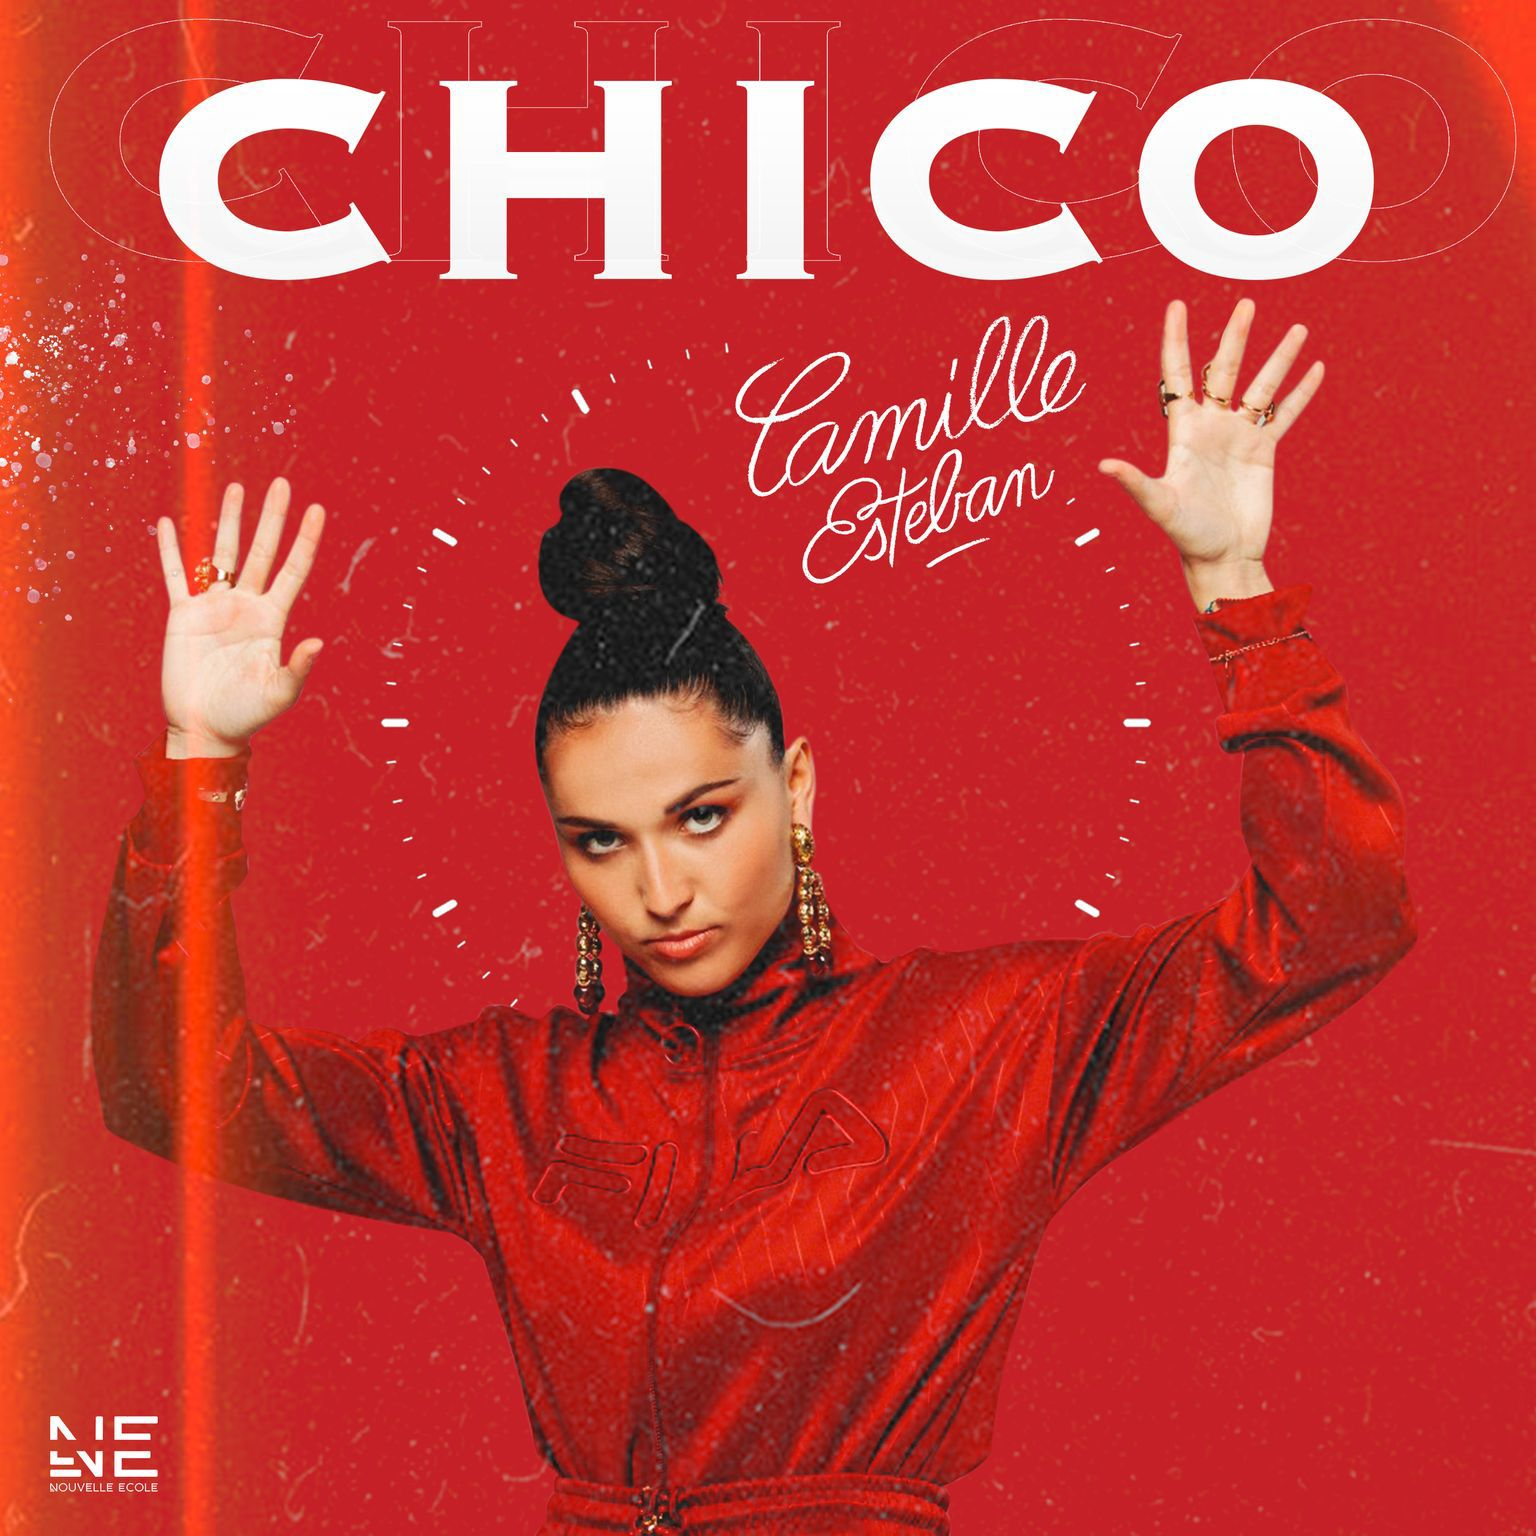 Camille Esteban, The Voice, Chico